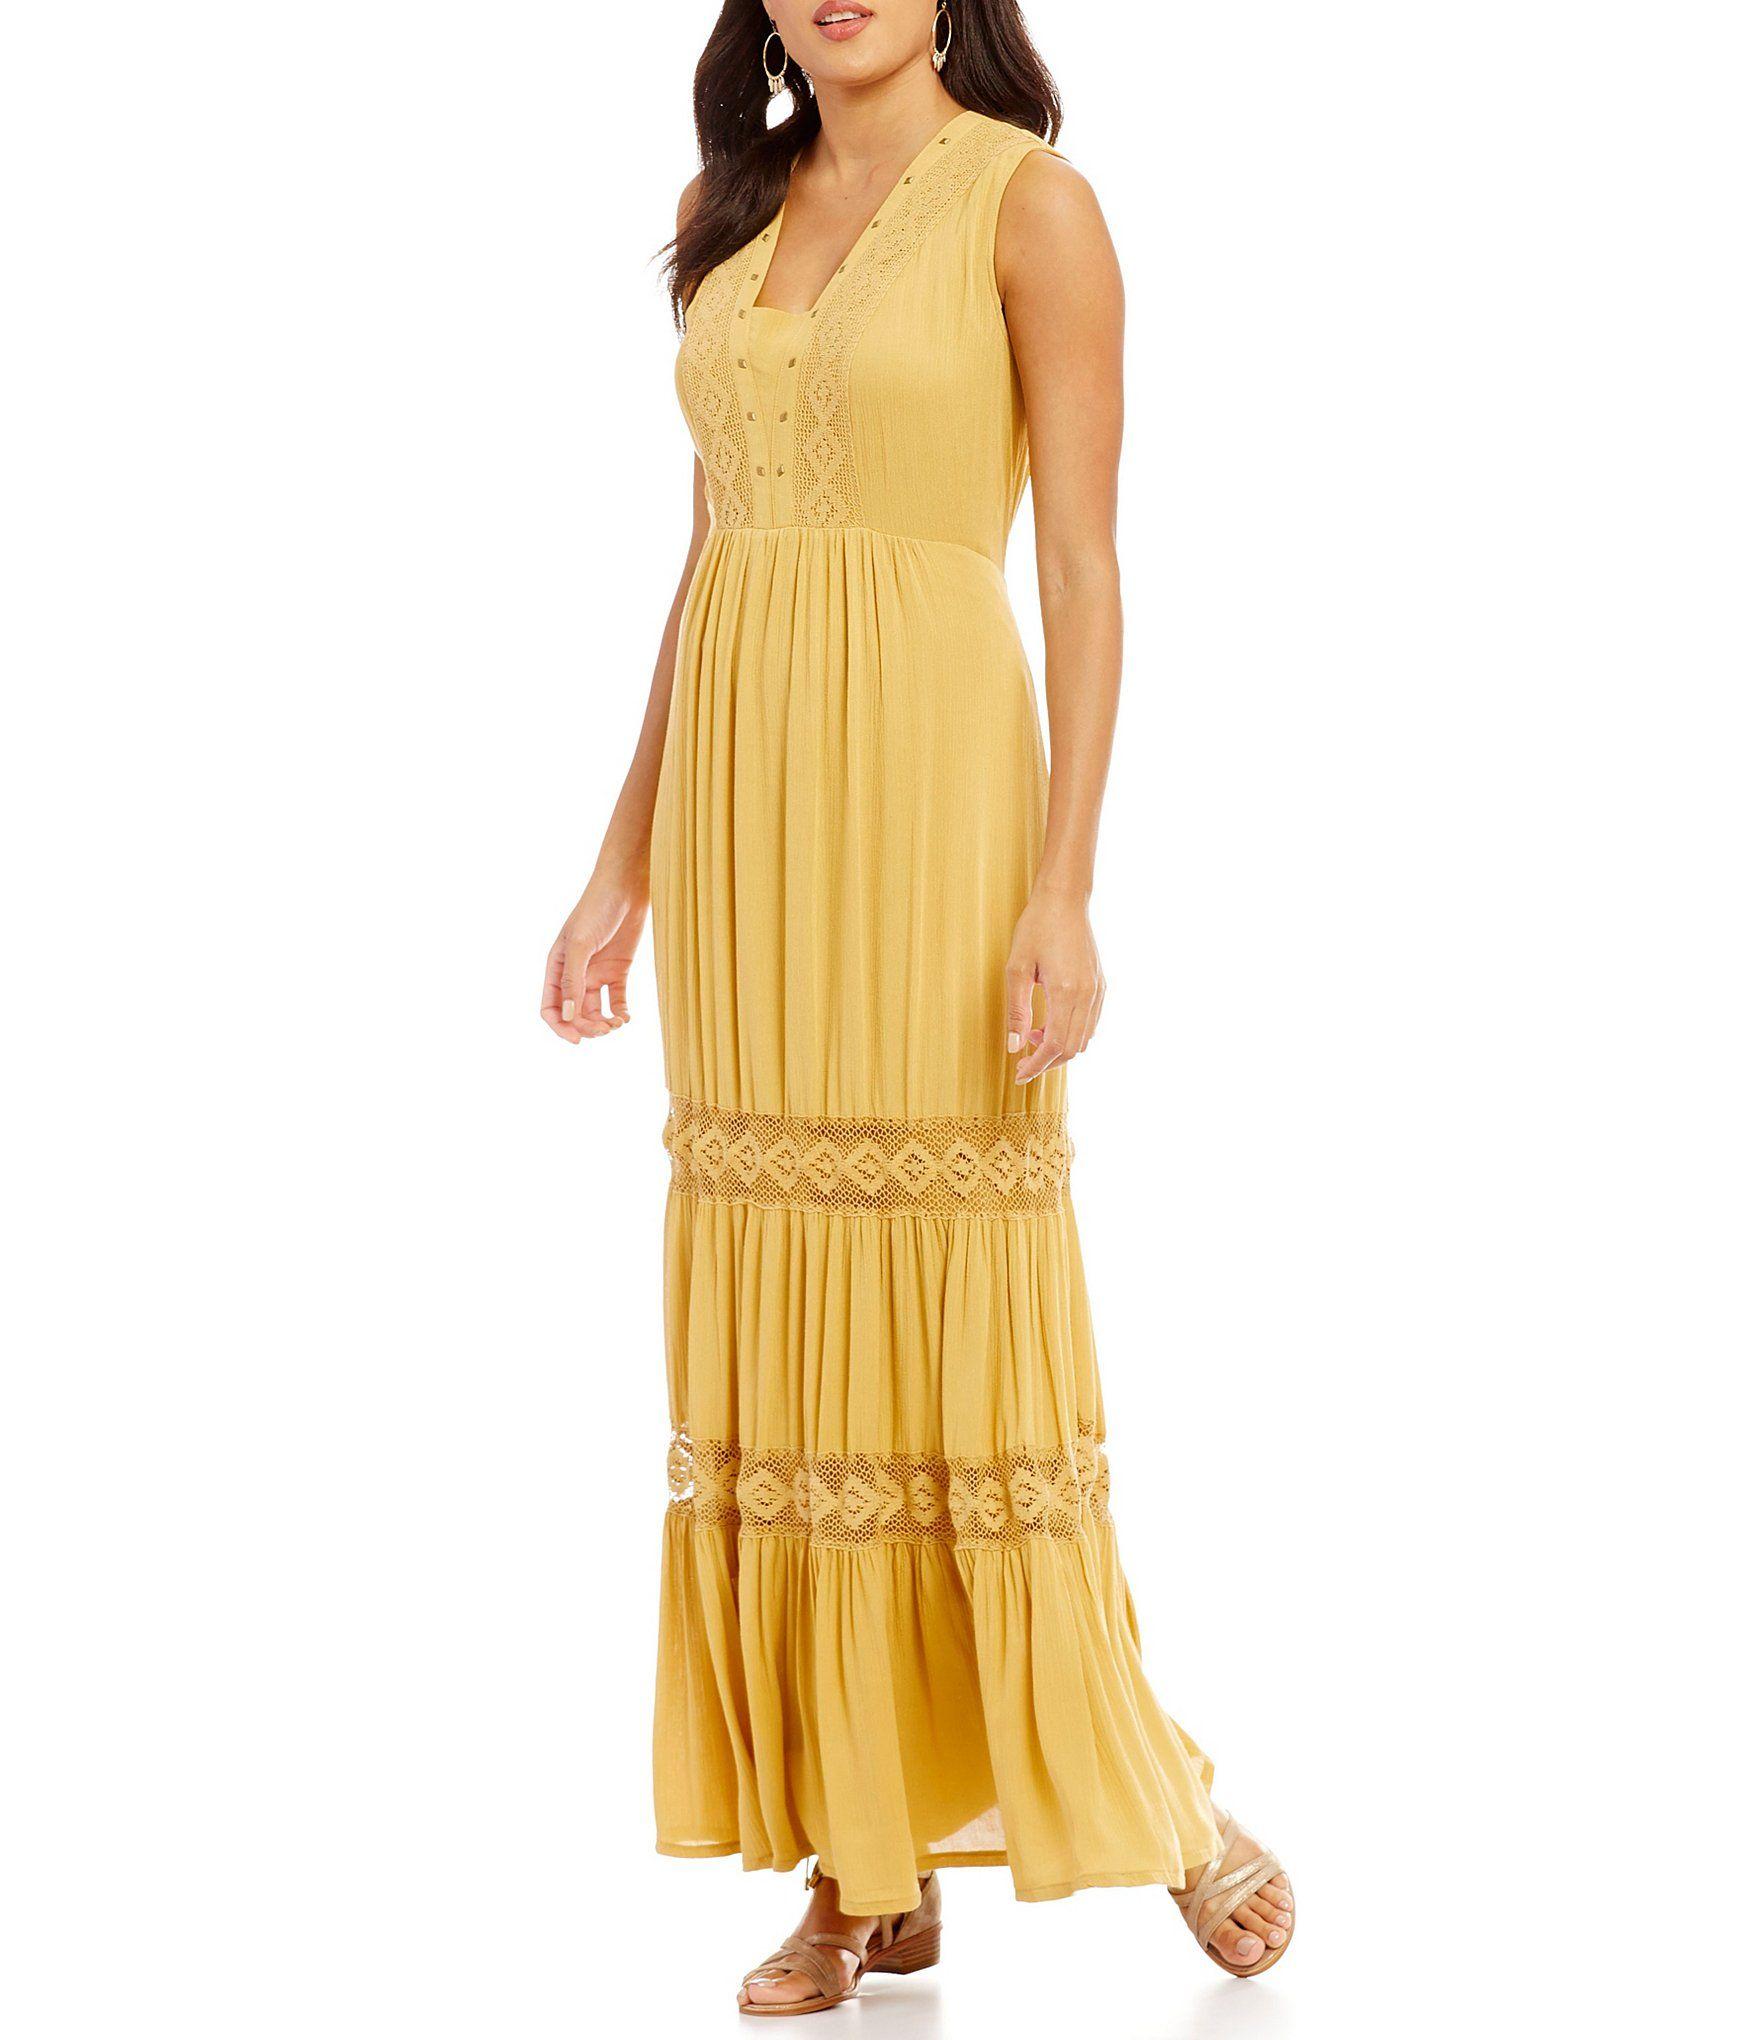 b509d9022fd Reba Crinkled Tiered Dress